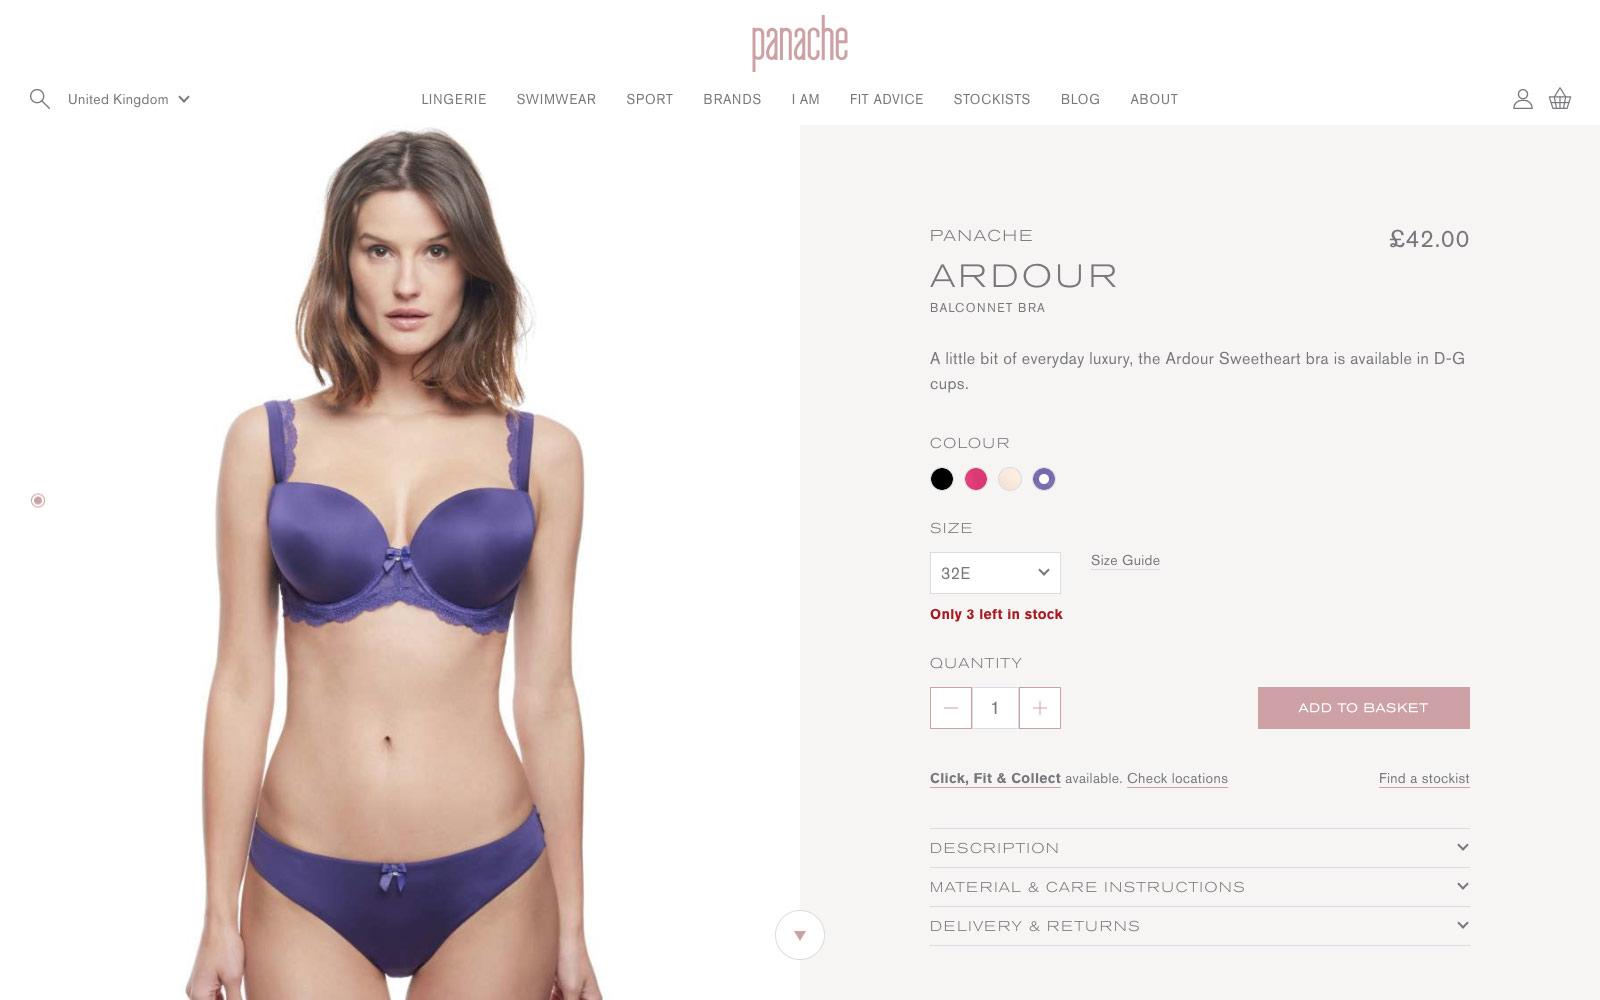 Panache website product view